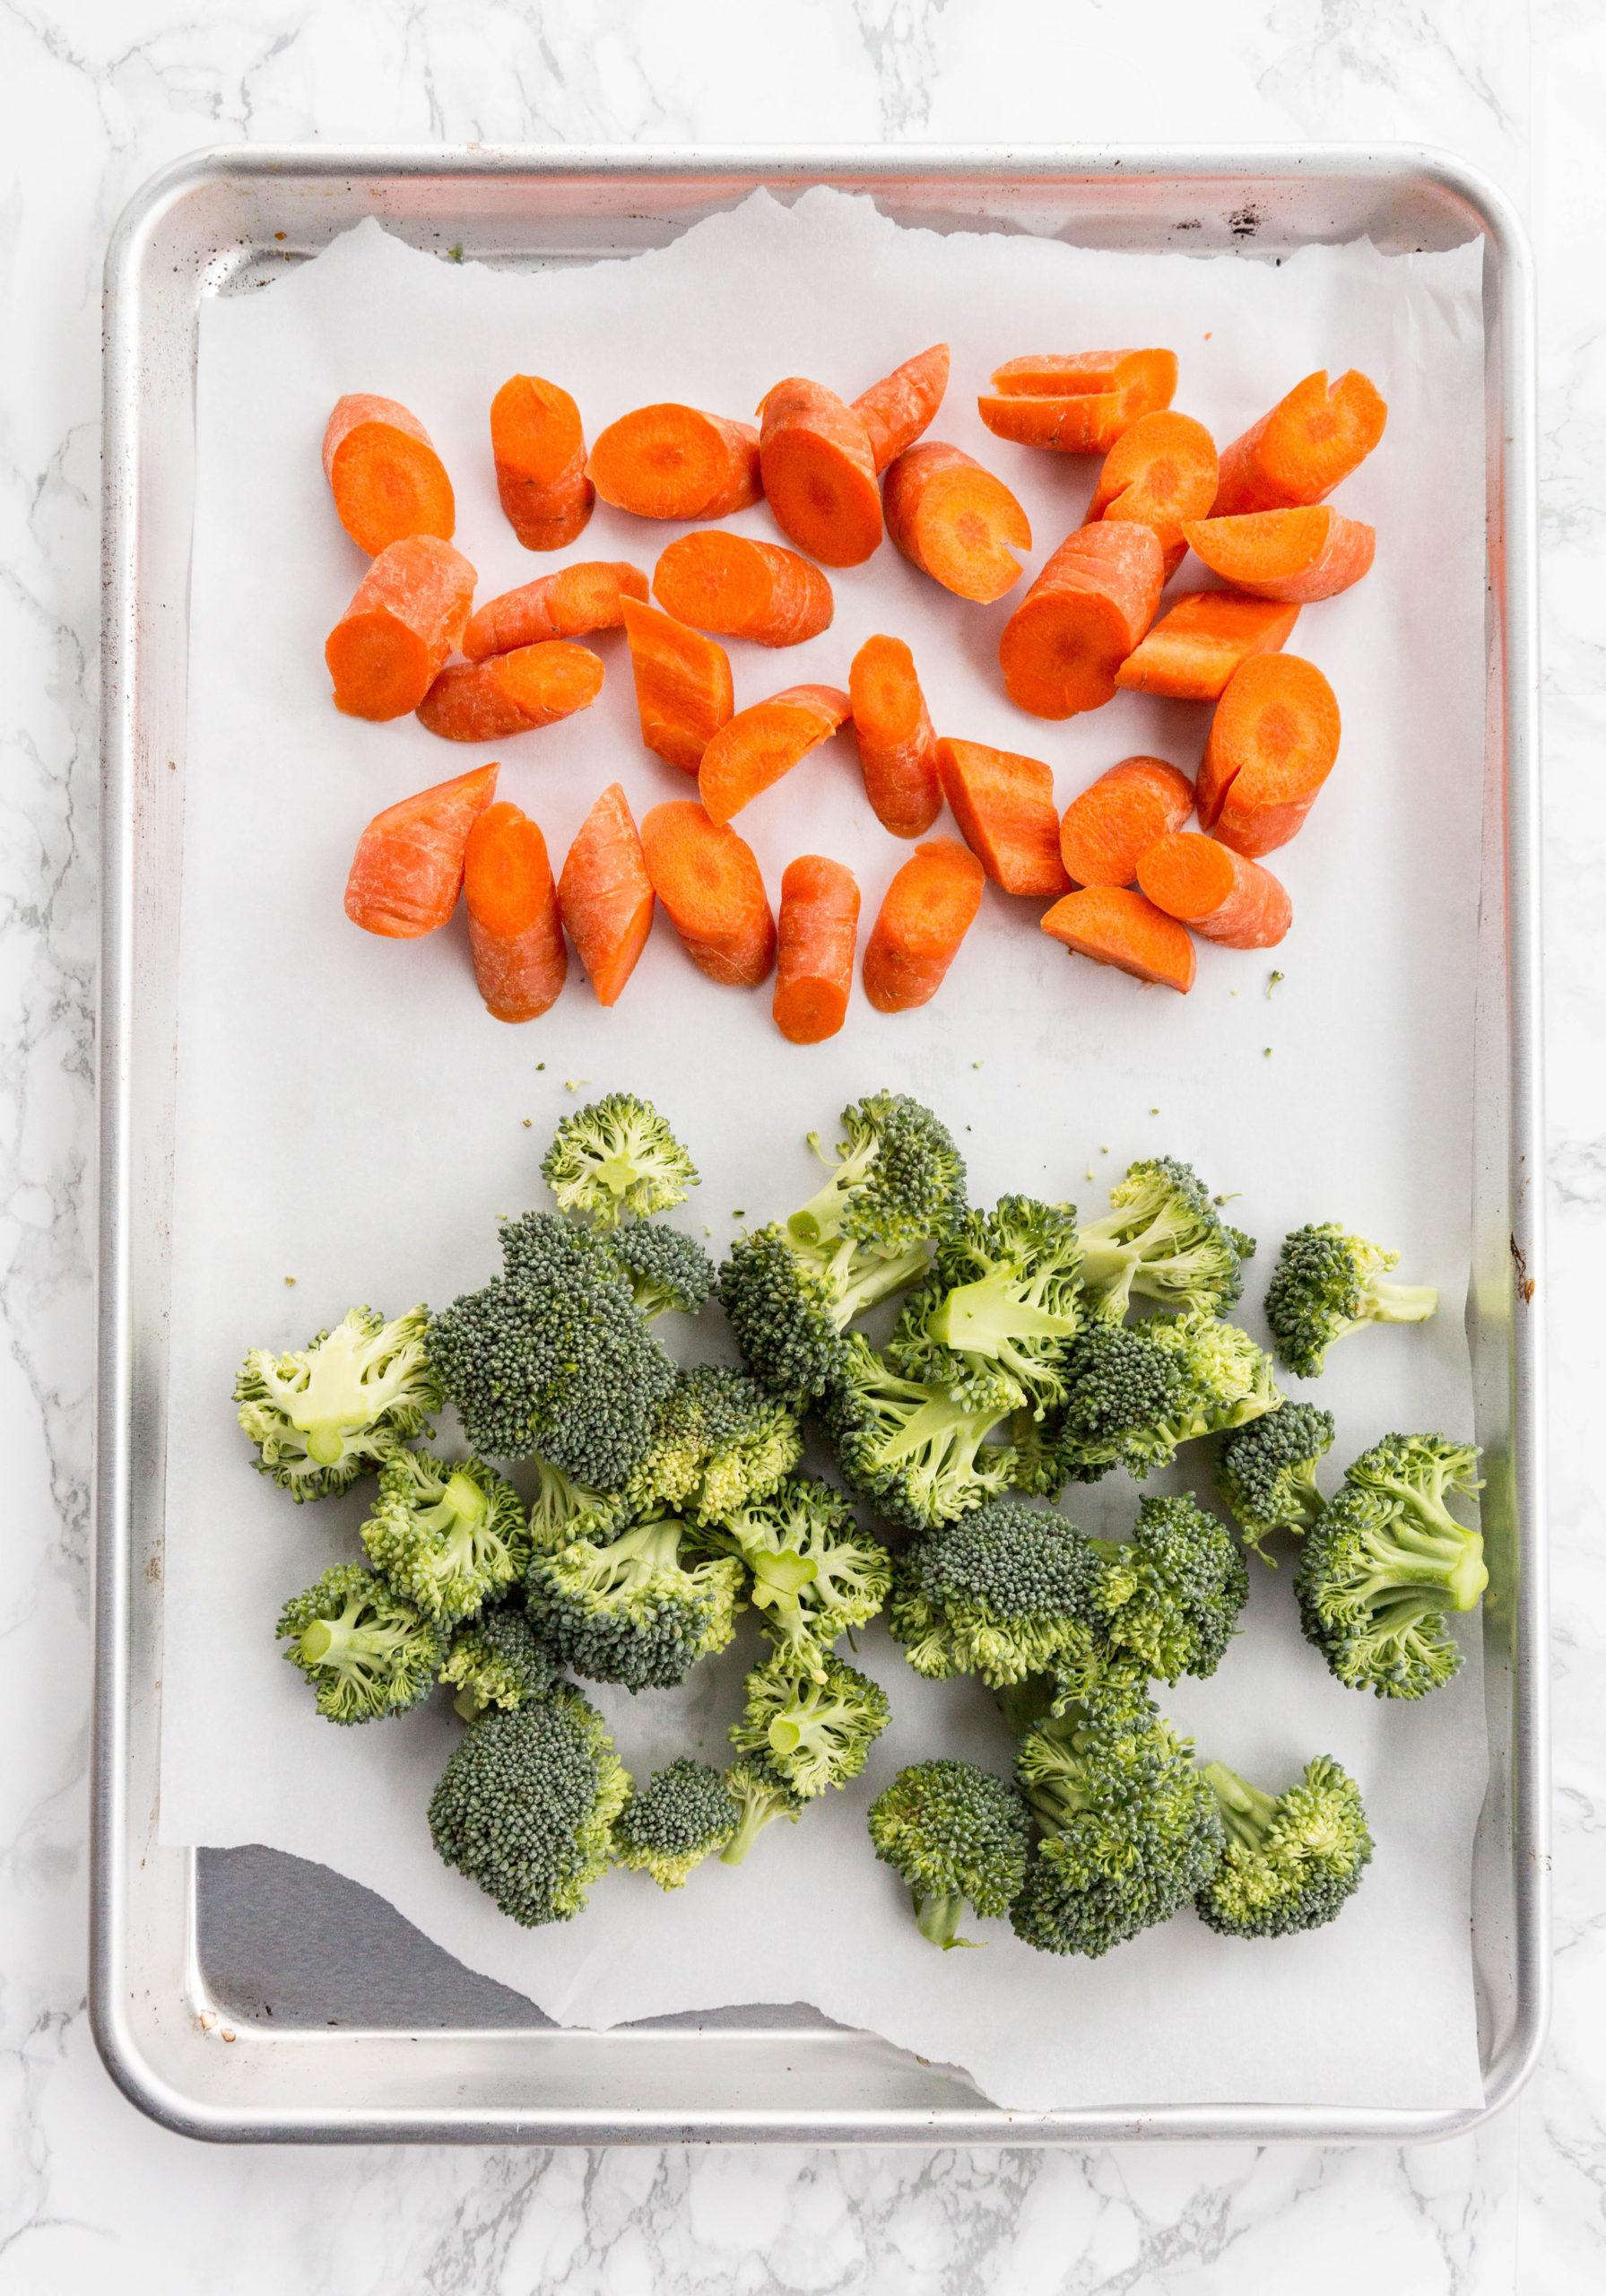 Roasted Vegetables Guide